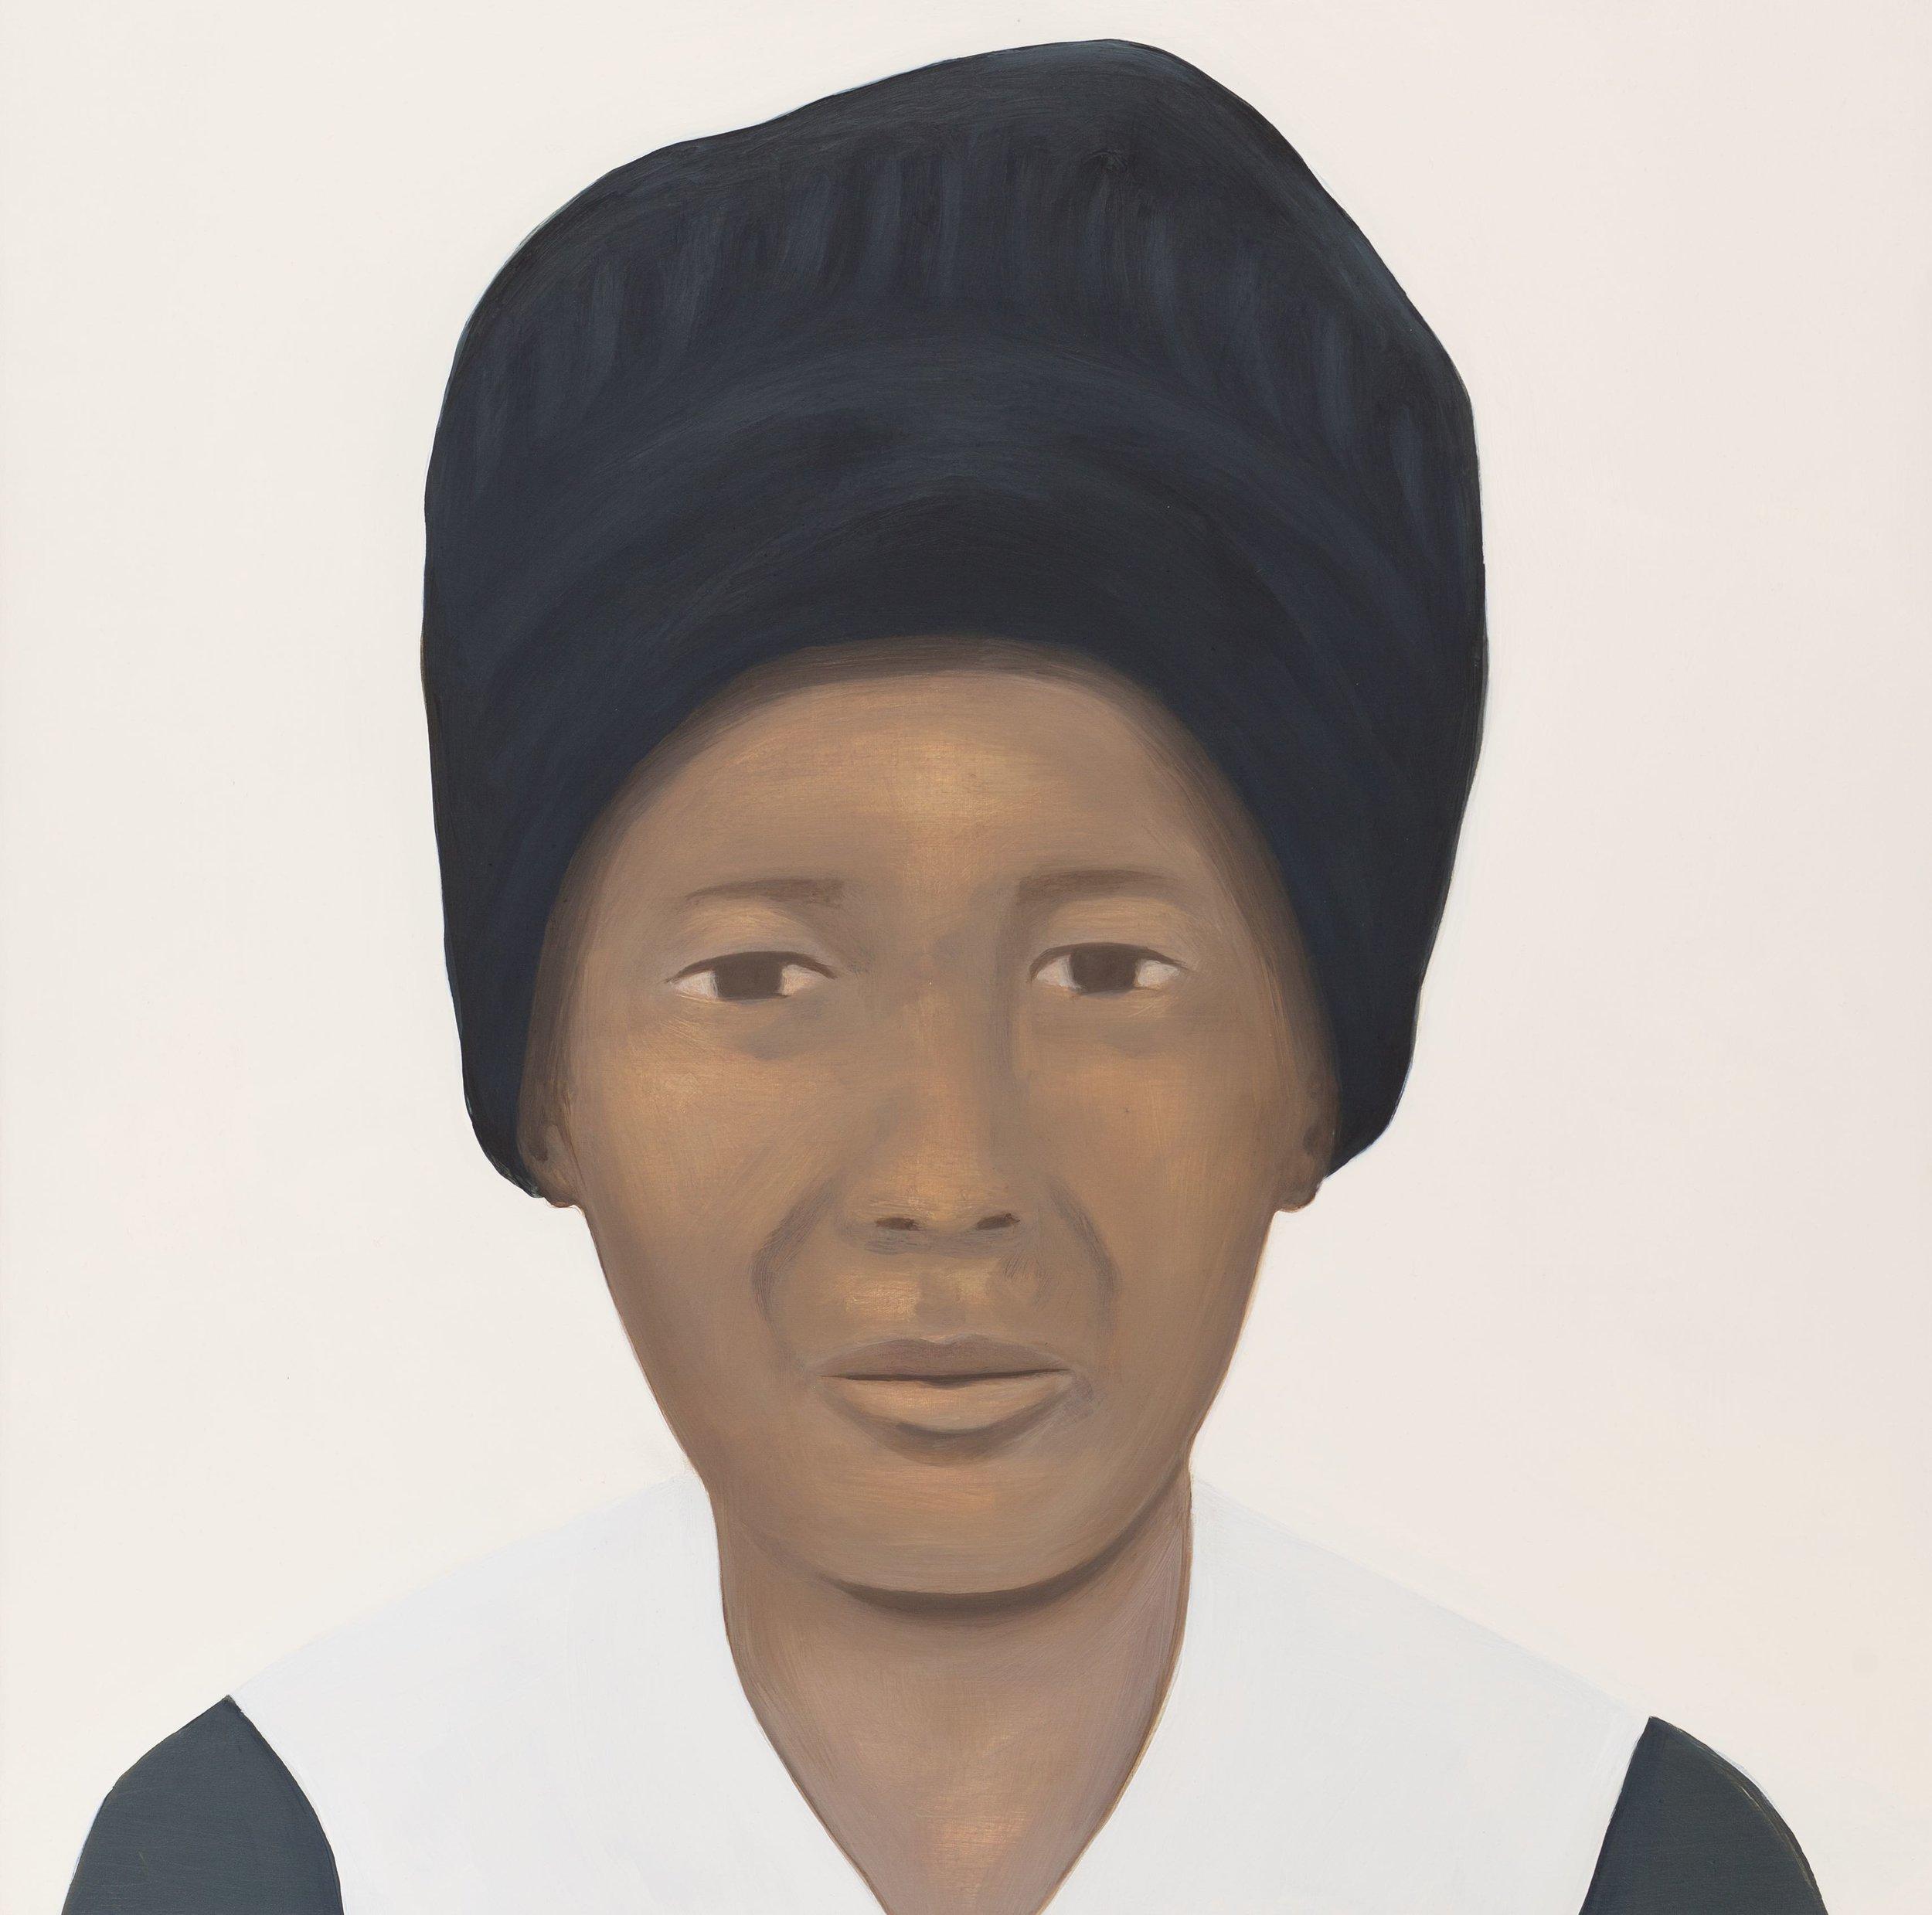 Sibolile (After Sibolile Nkosi) 2013